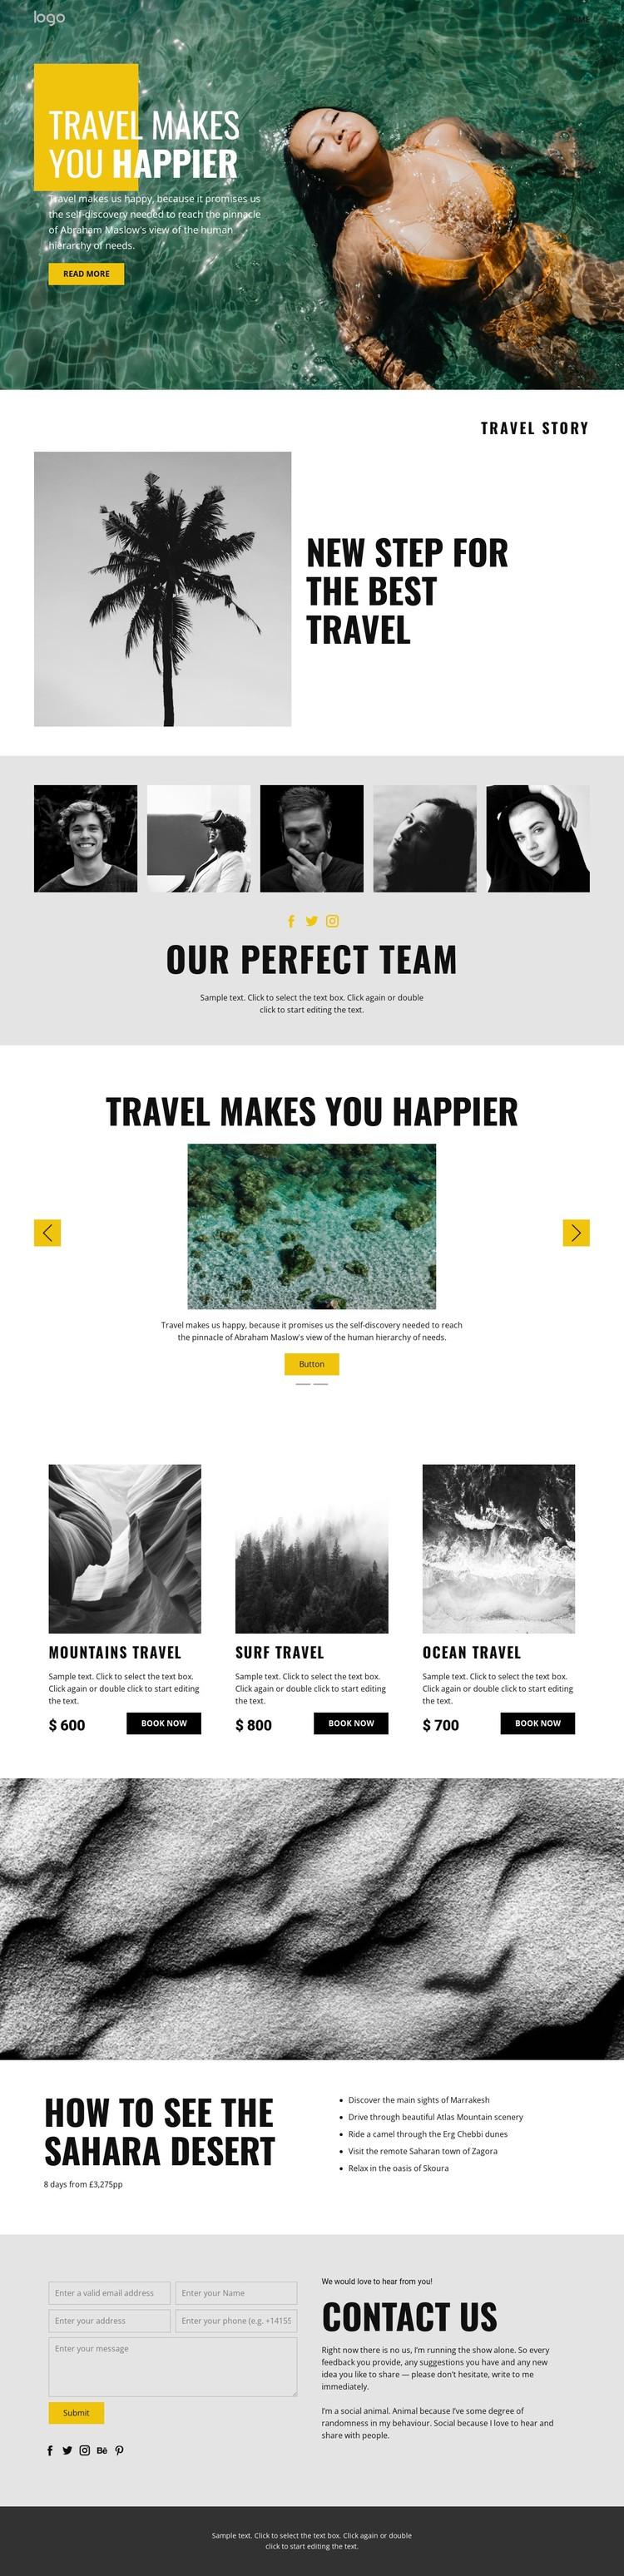 Happy people deserve travel Static Site Generator